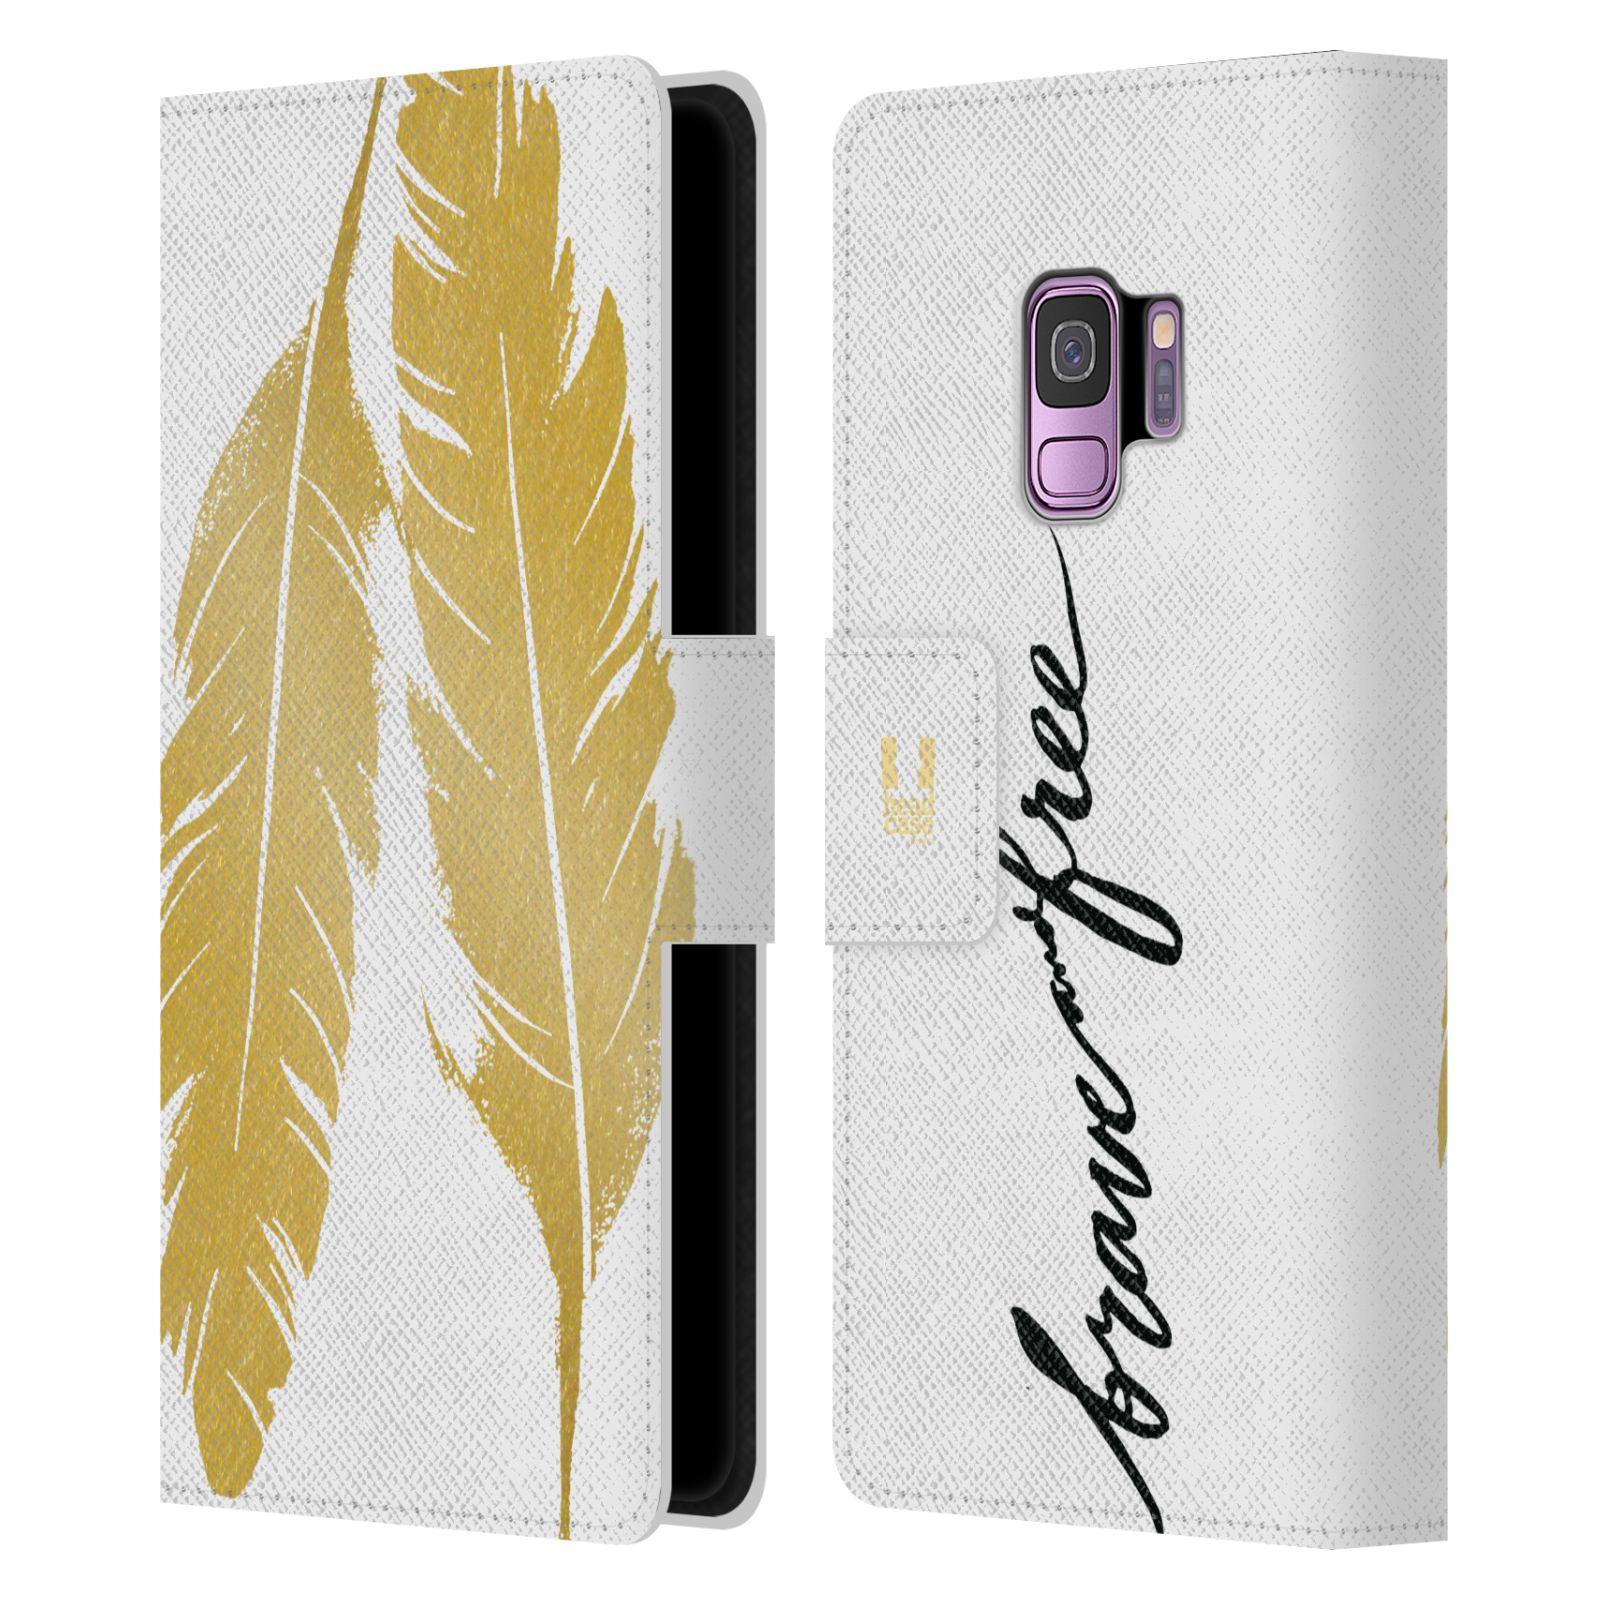 Pouzdro na mobil Samsung Galaxy S9 - Head Case - Fashion zlaté pírka